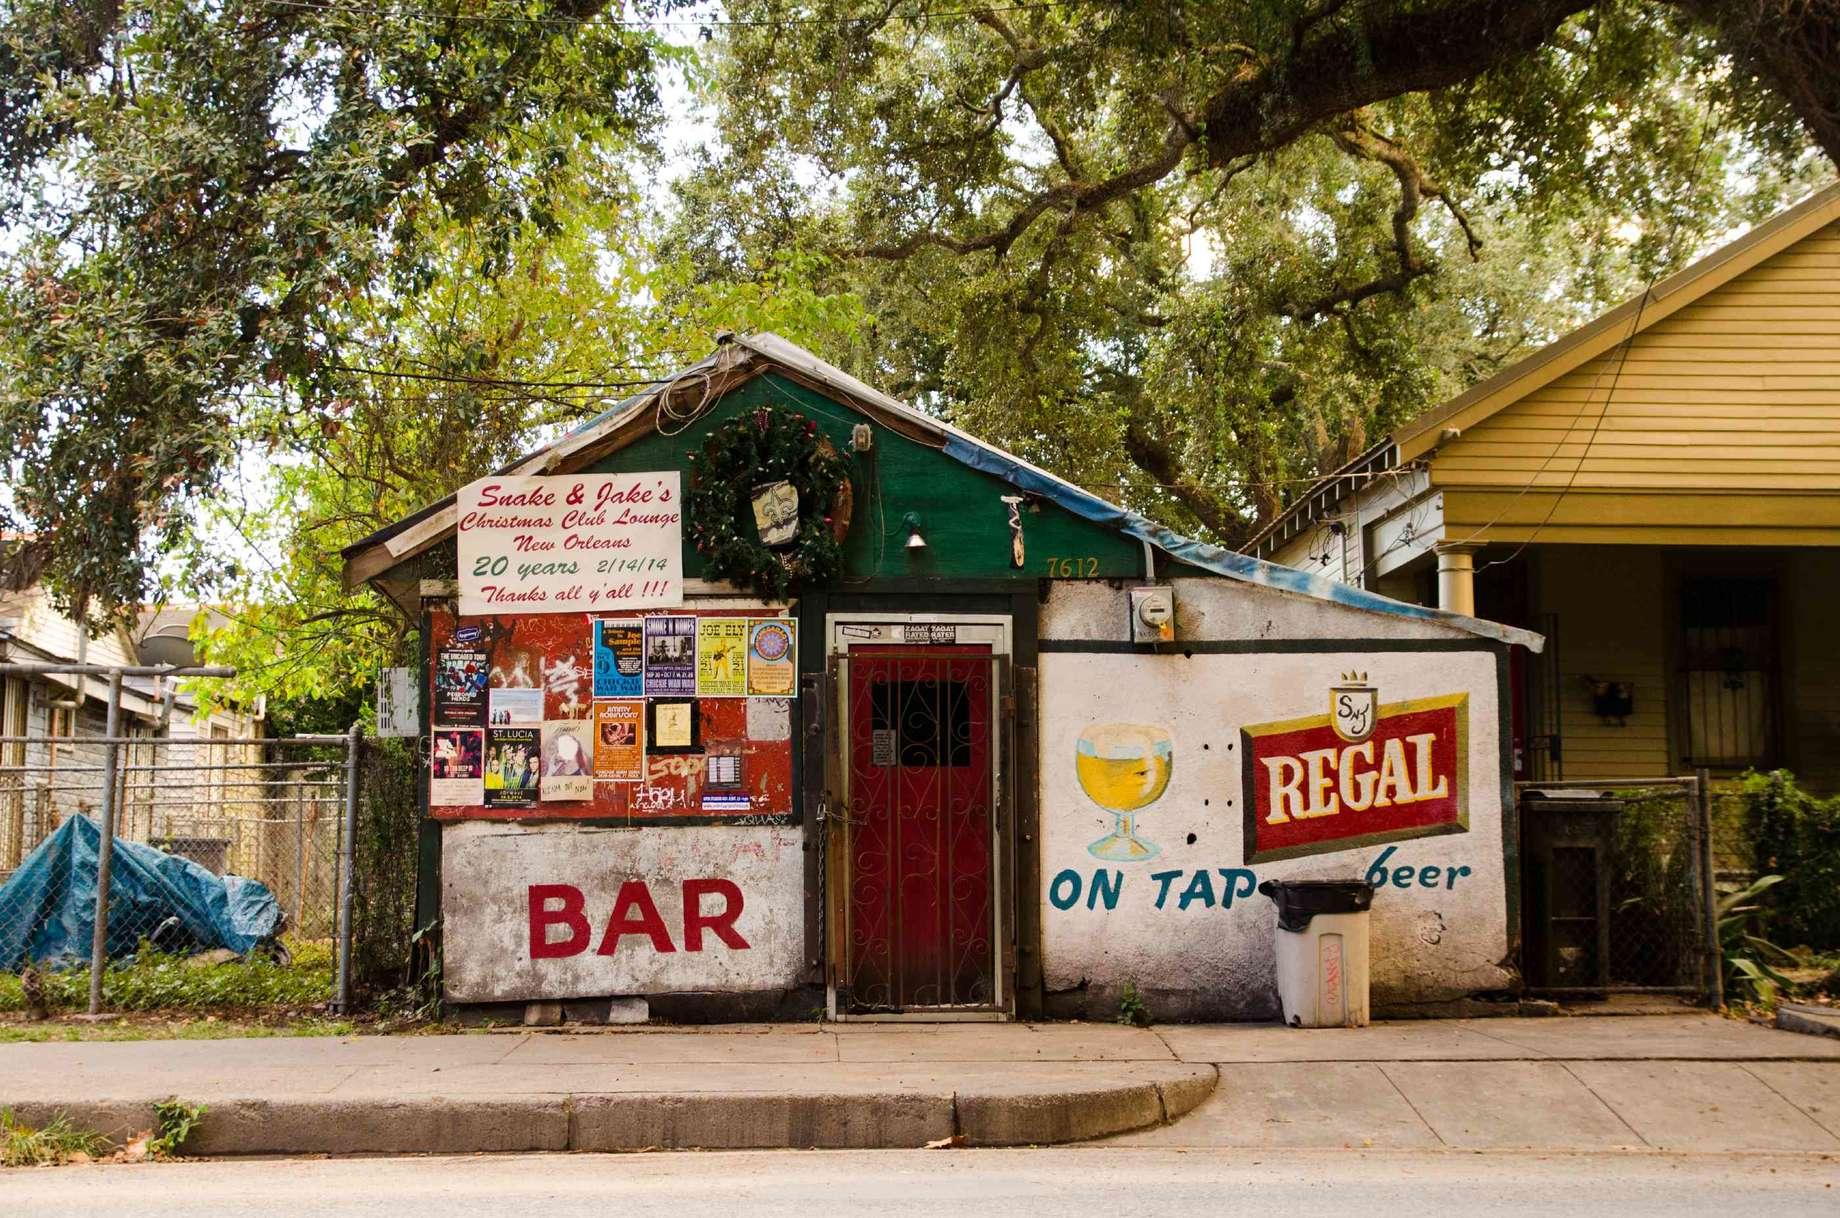 The 31 Greatest Bar Names in America - Featuring Jon Taffer - Thrillist